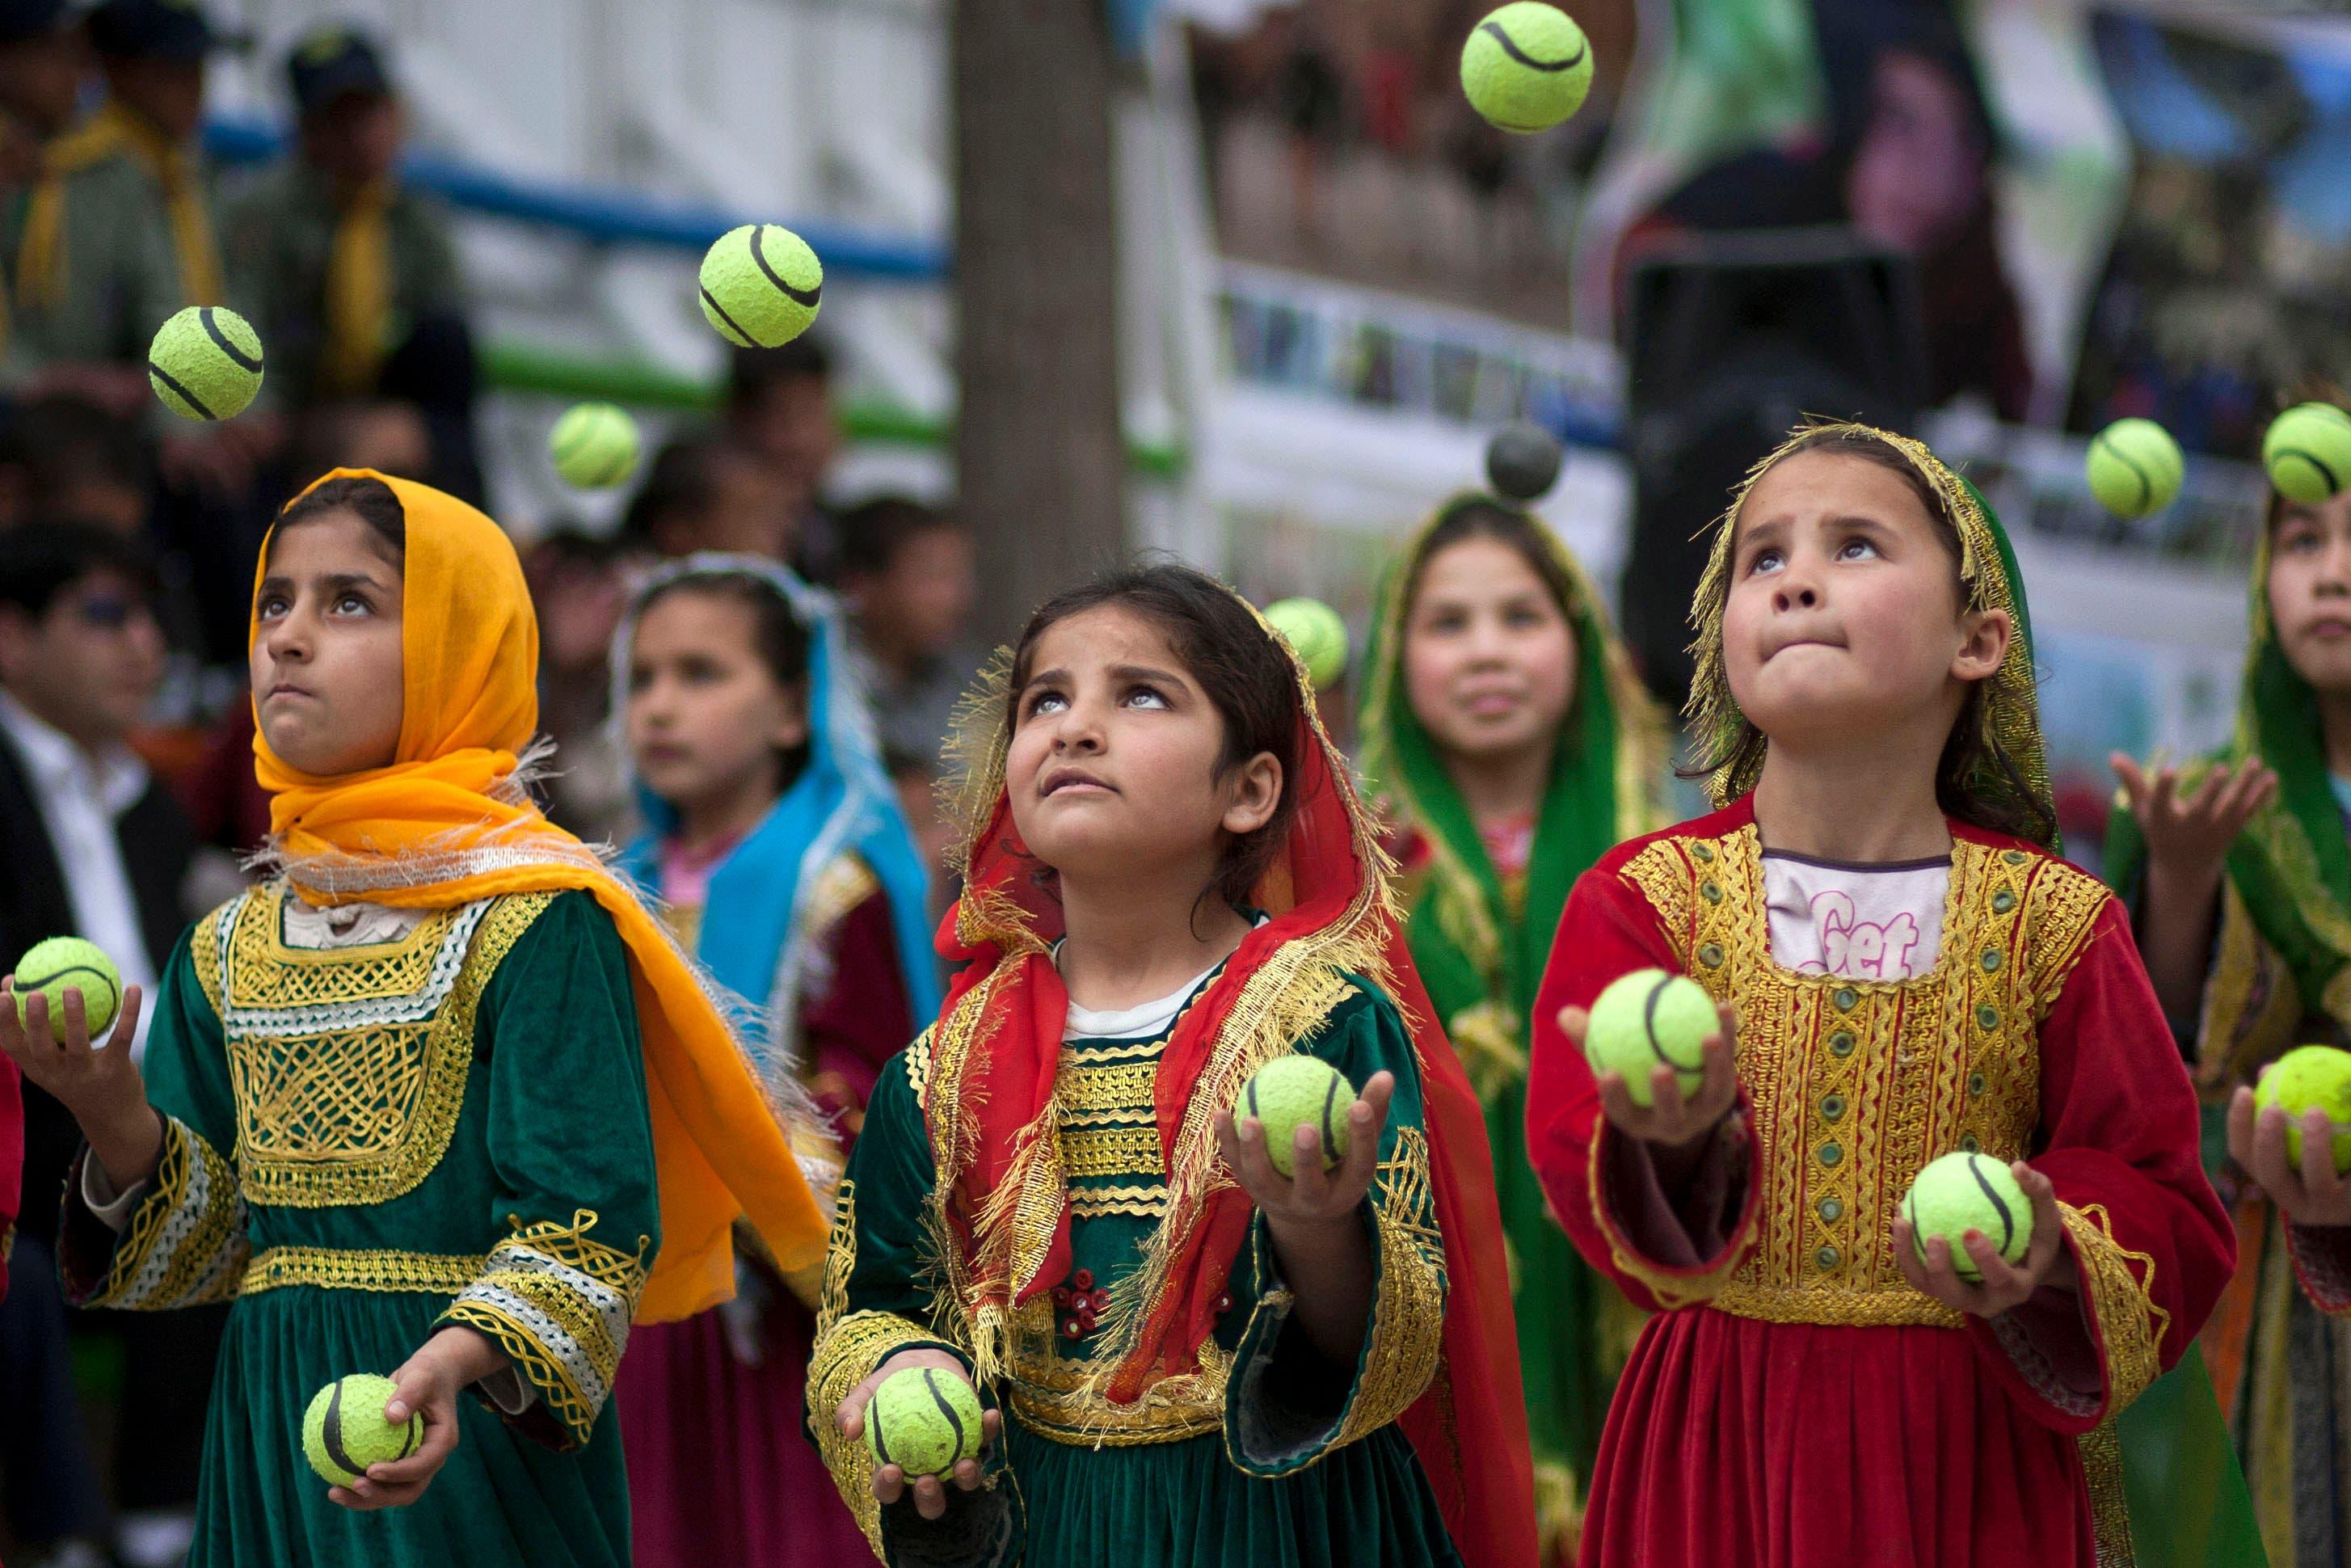 Children work a juggling act